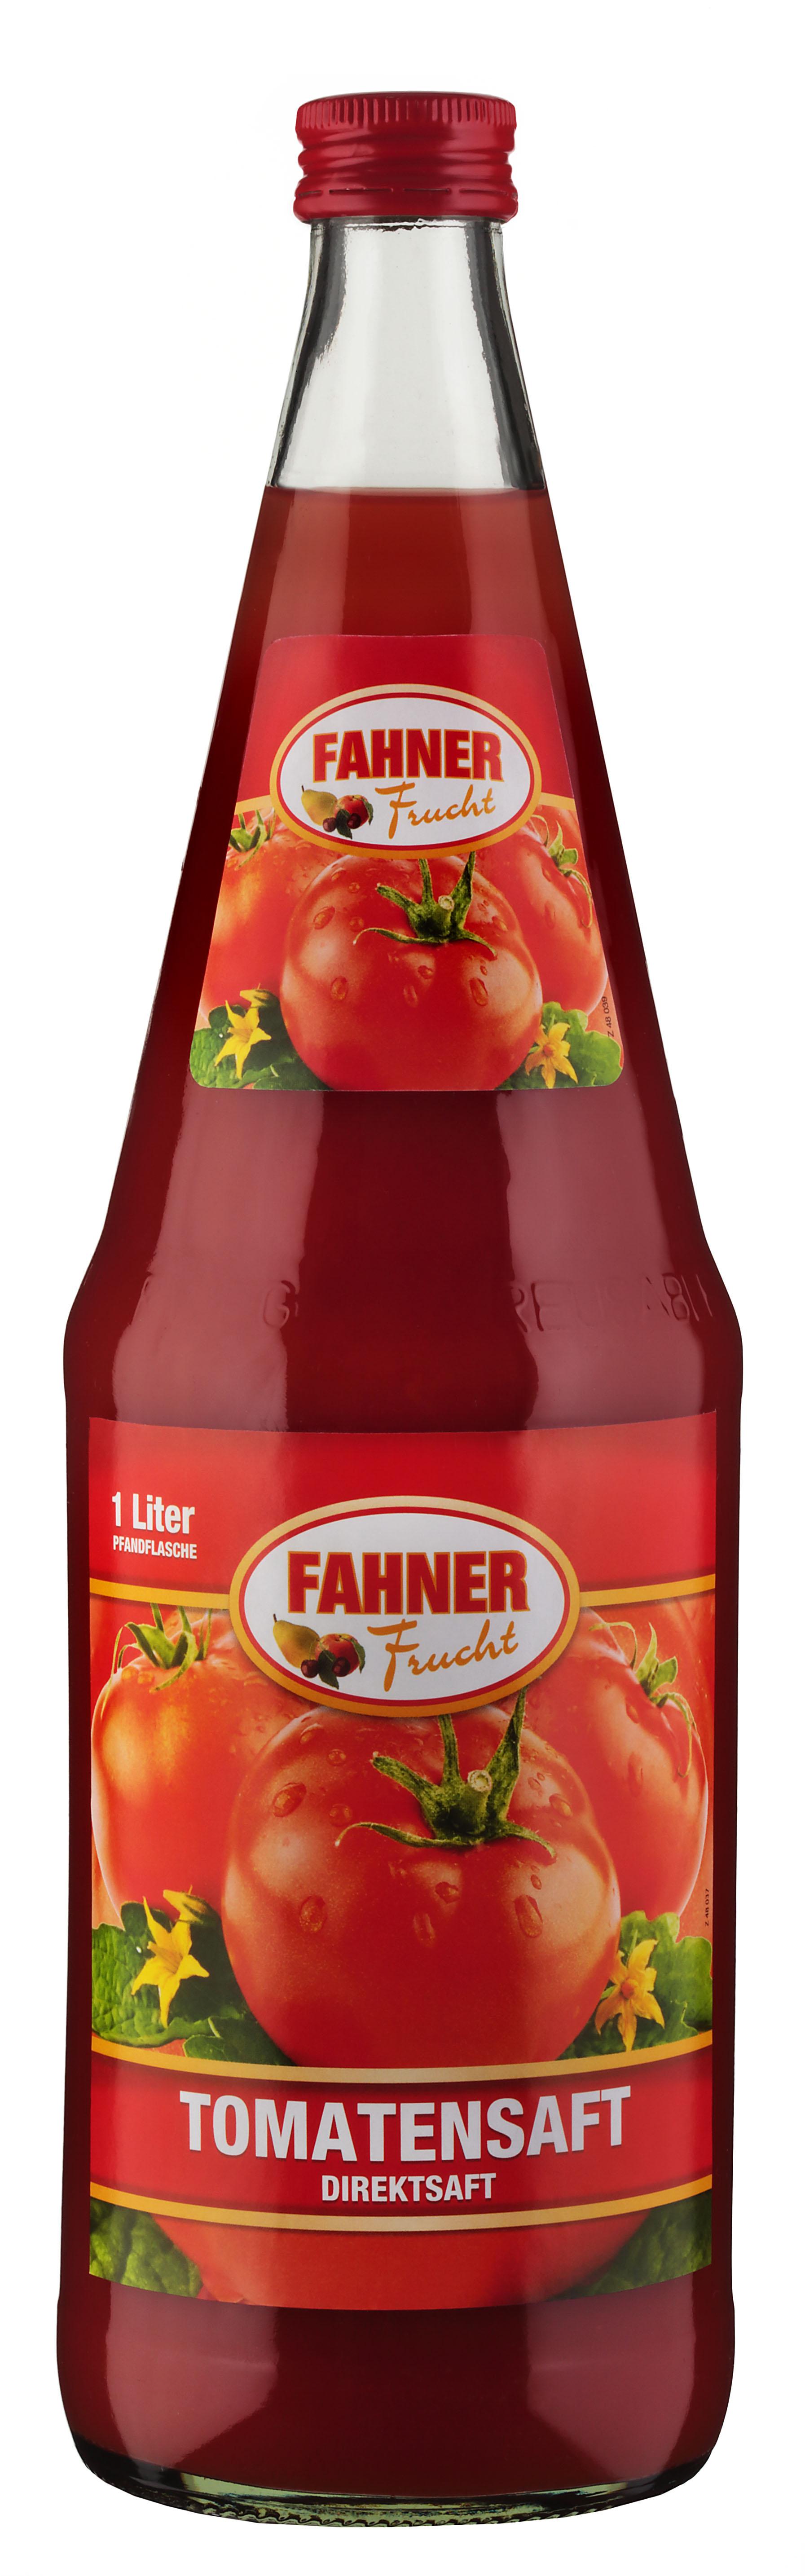 FAHNER Tomatensaft 6x1 l